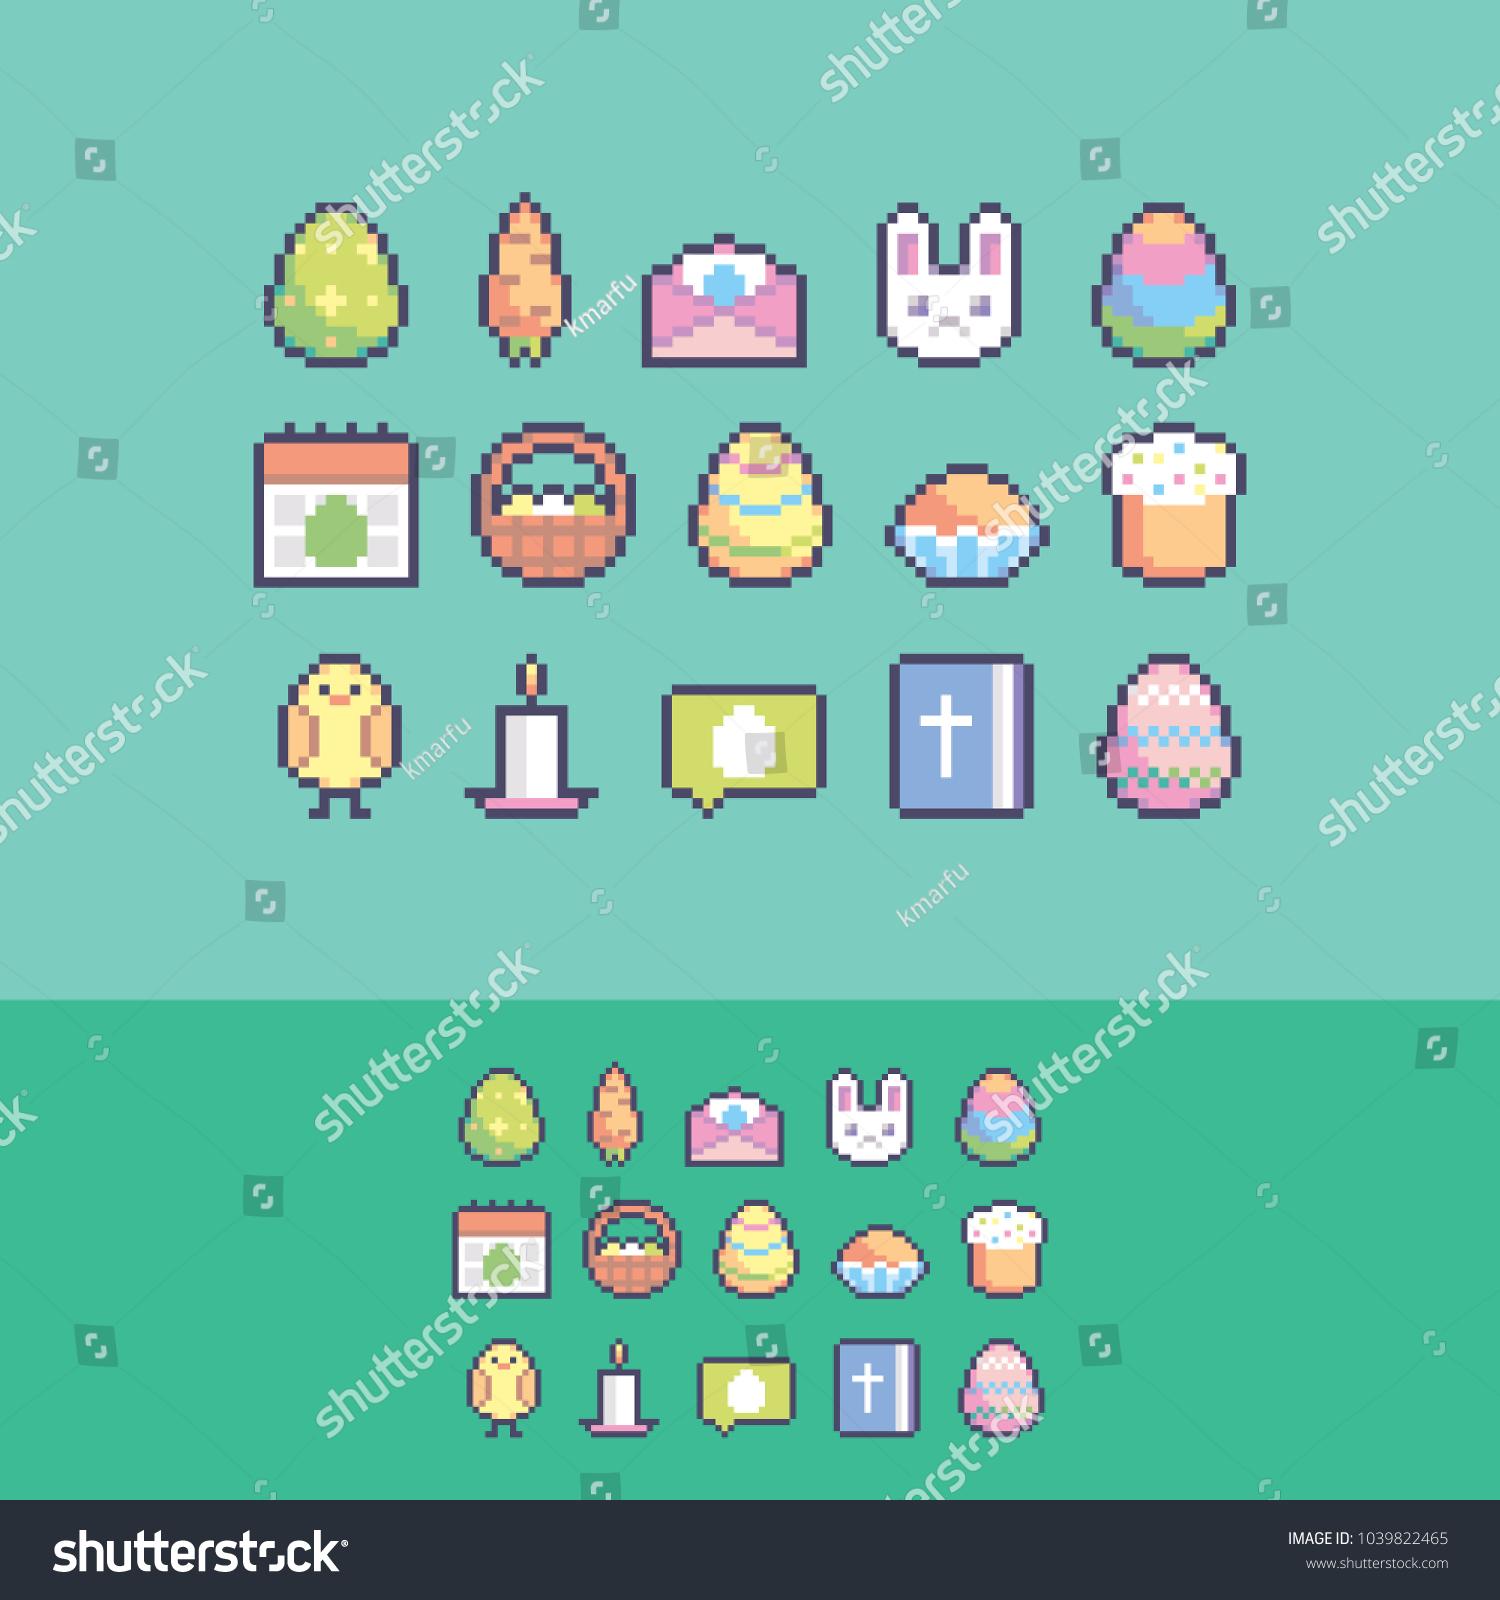 Pixel Art Cute Easter Vector Icons Stock Vector 1039822465 ...